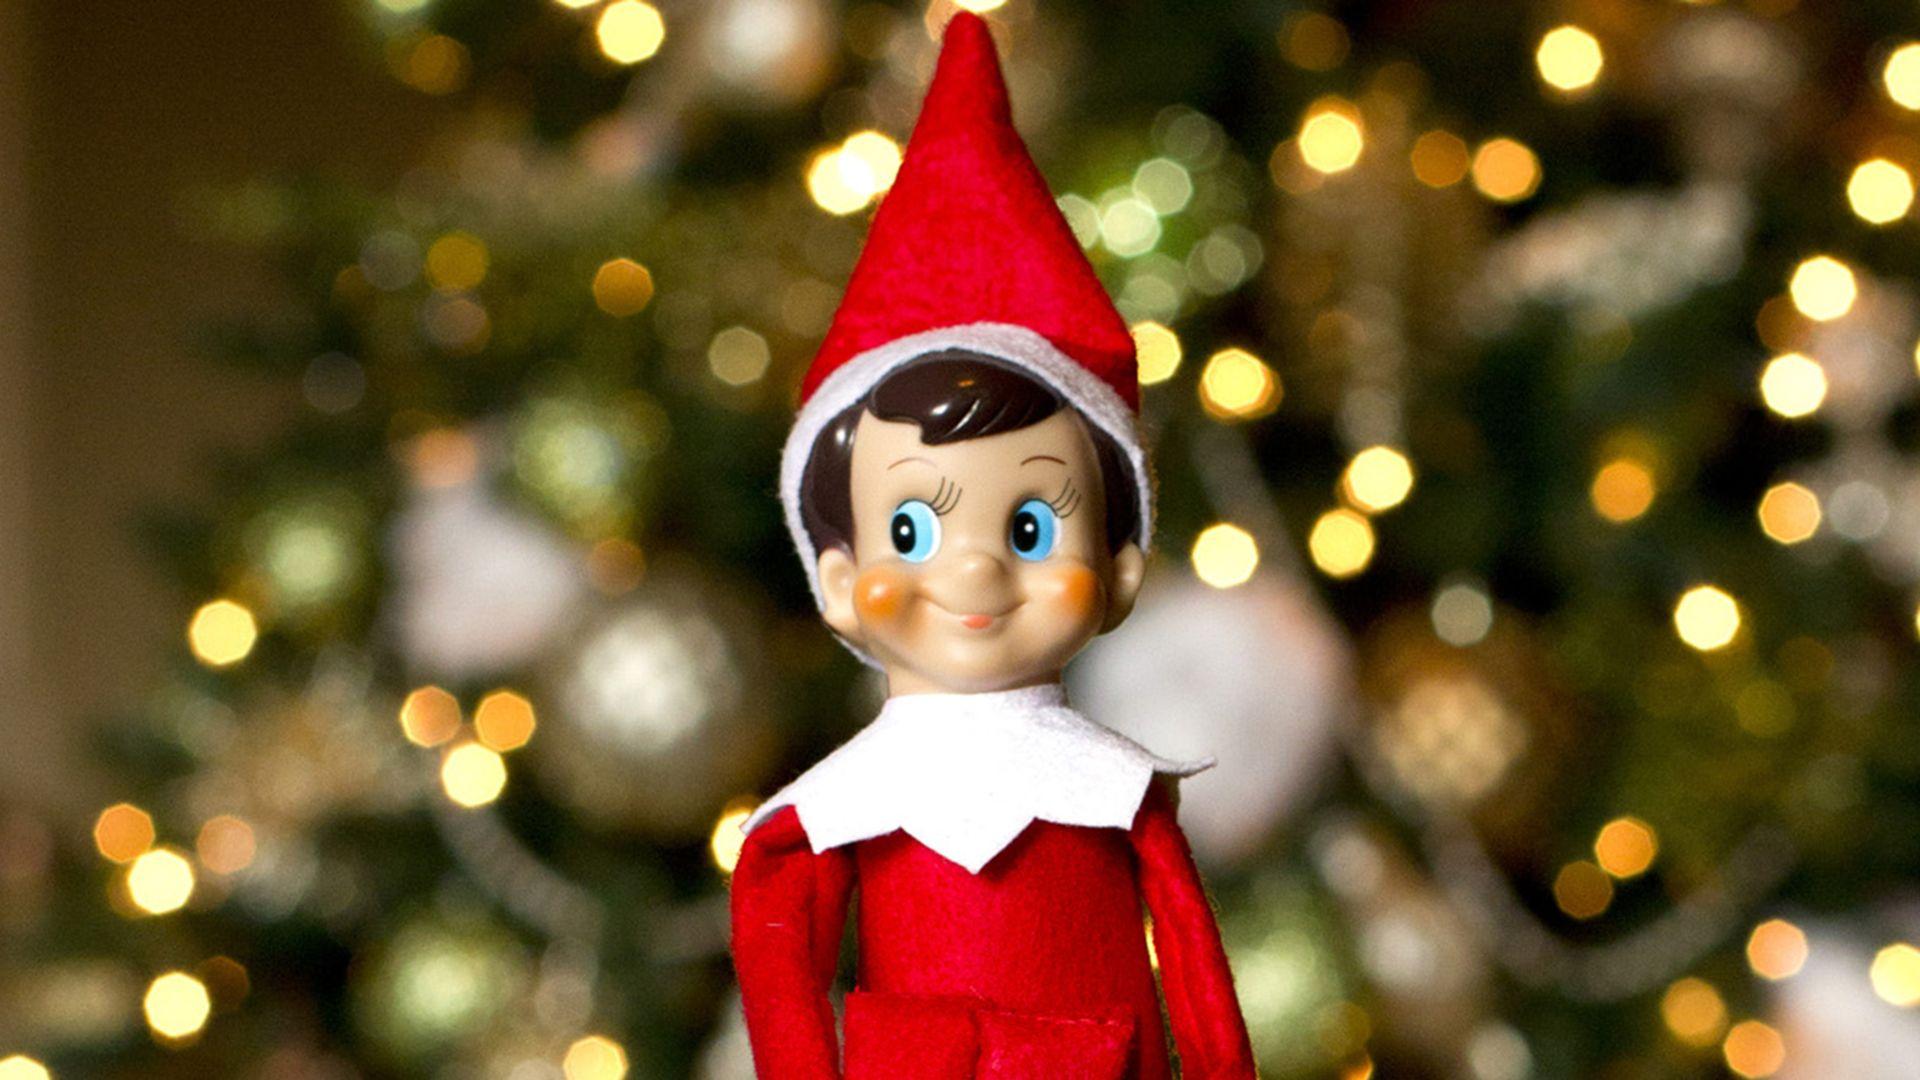 25 elf on the shelf ideas fun ideas for christmas elf on a shelf rh goodhousekeeping com elf shelf meme elf shelf return ideas